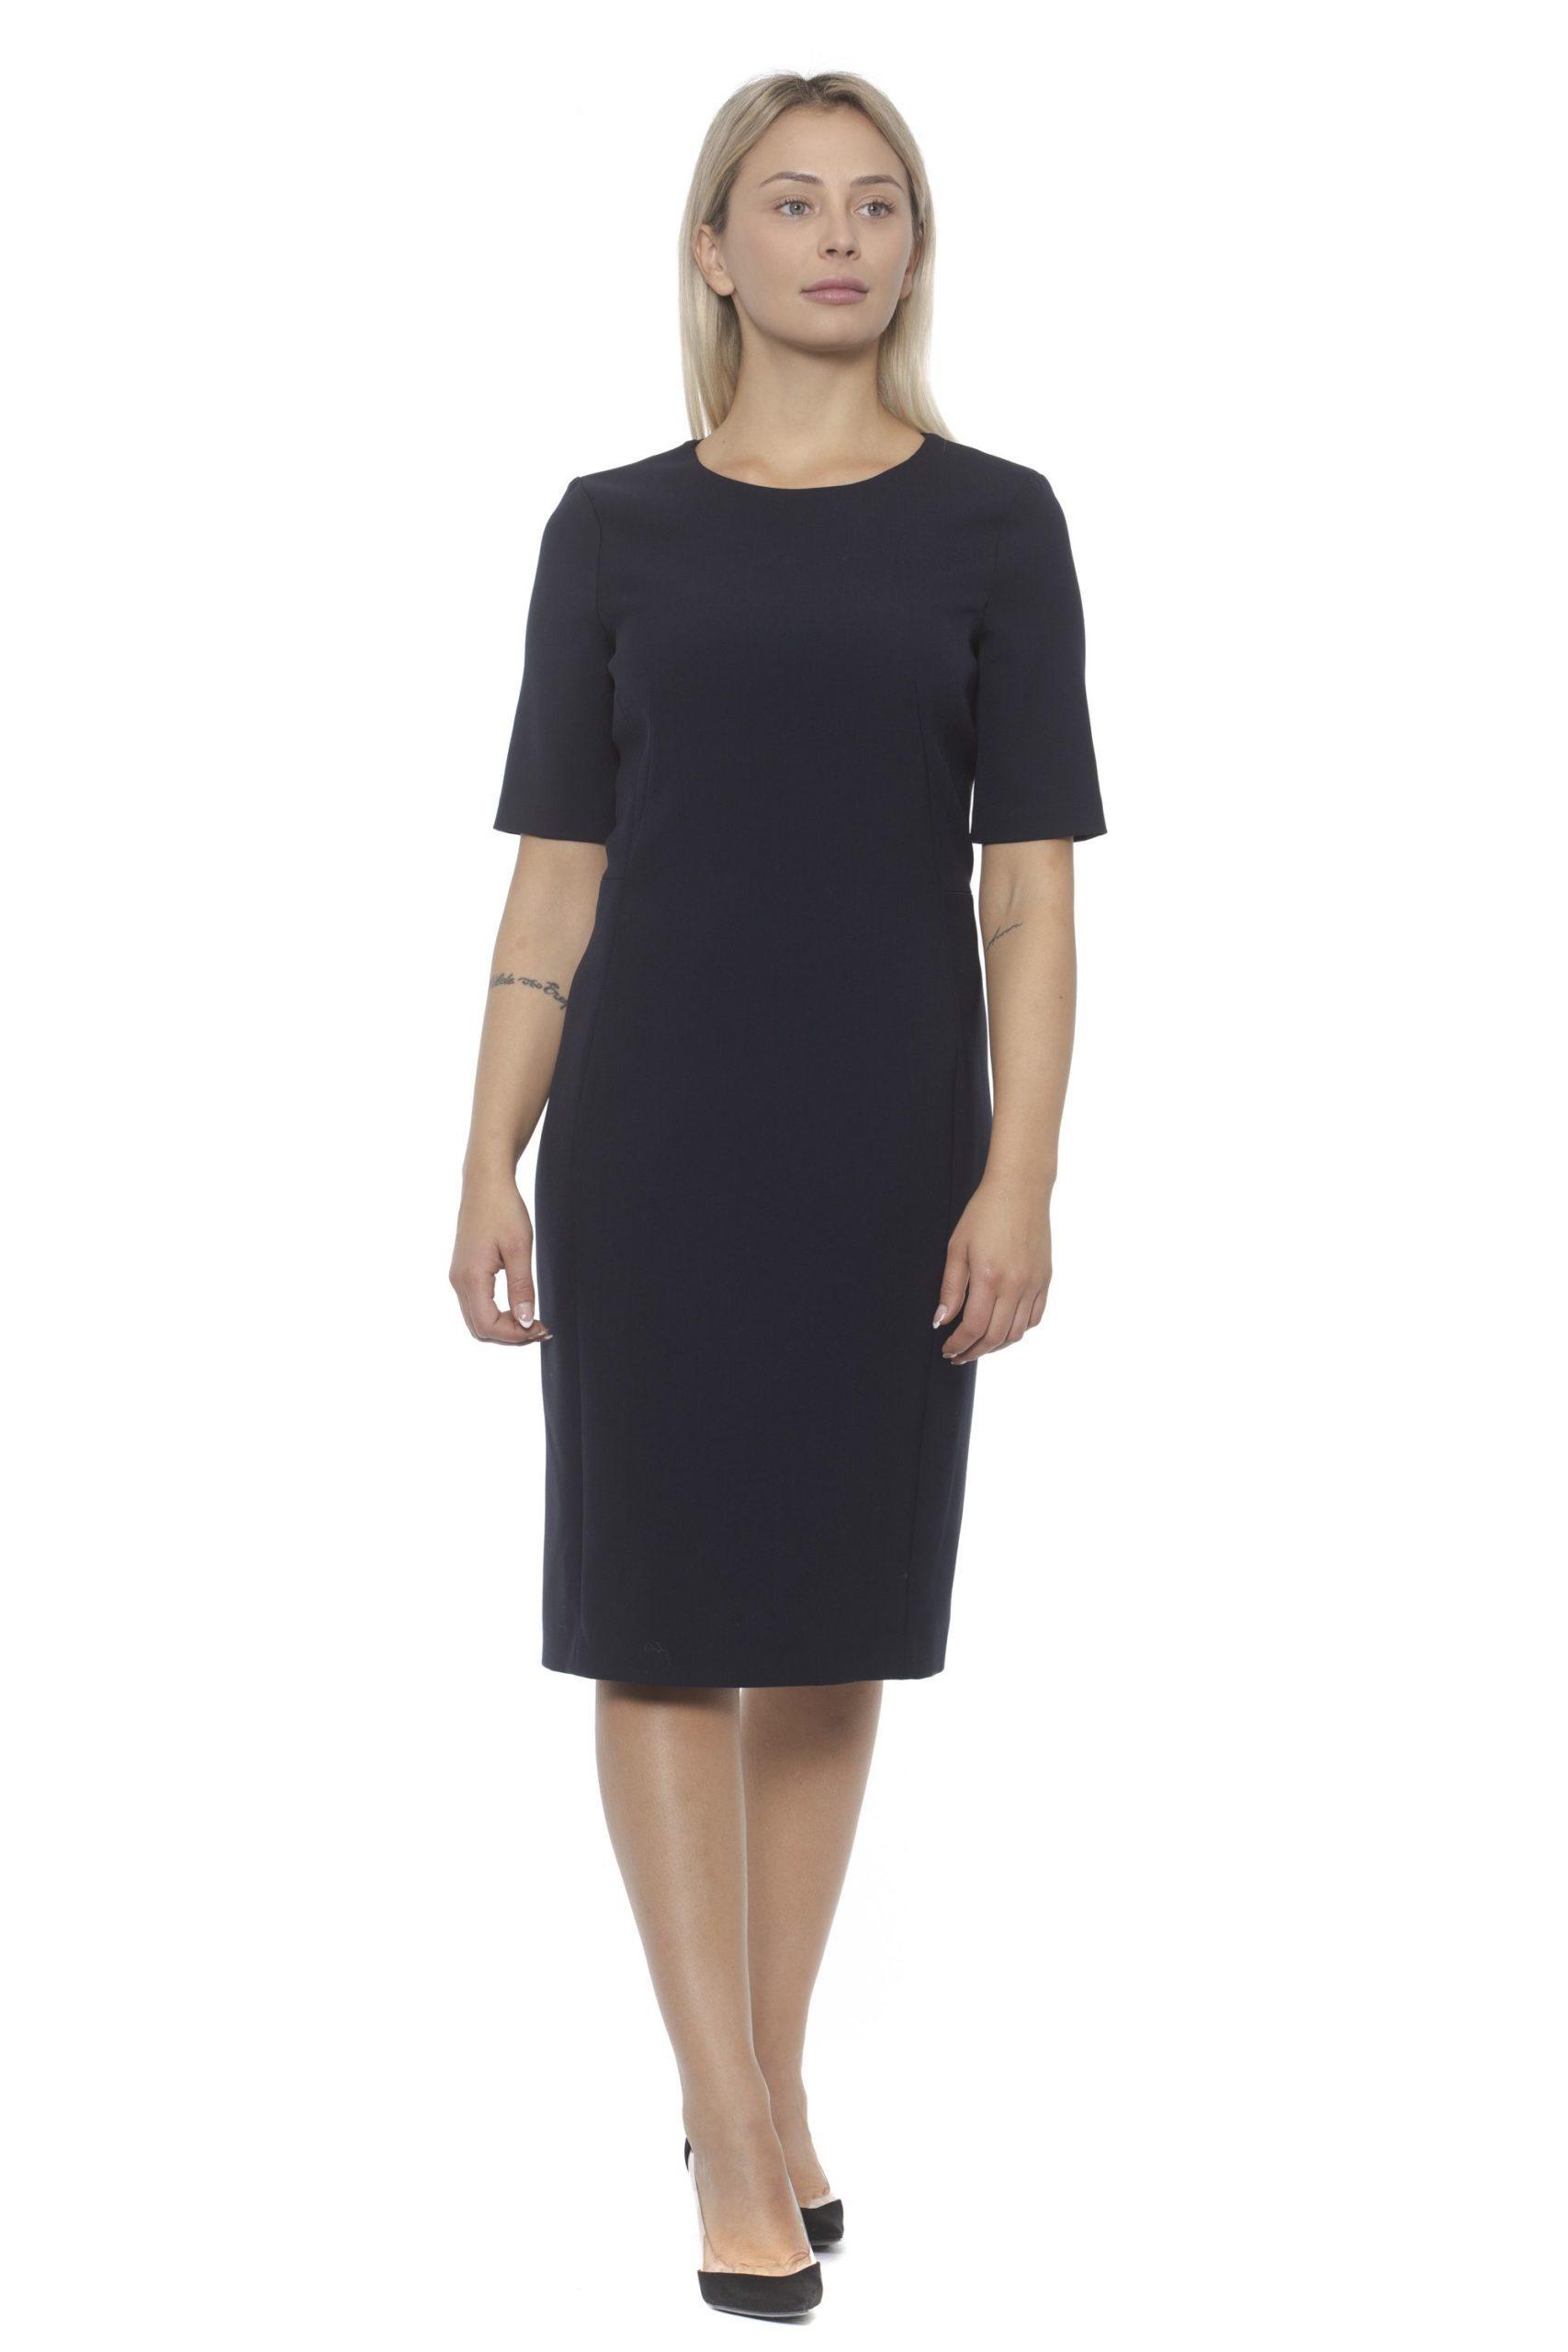 Peserico Women's Dress Blue PE1383190 - IT42 | S